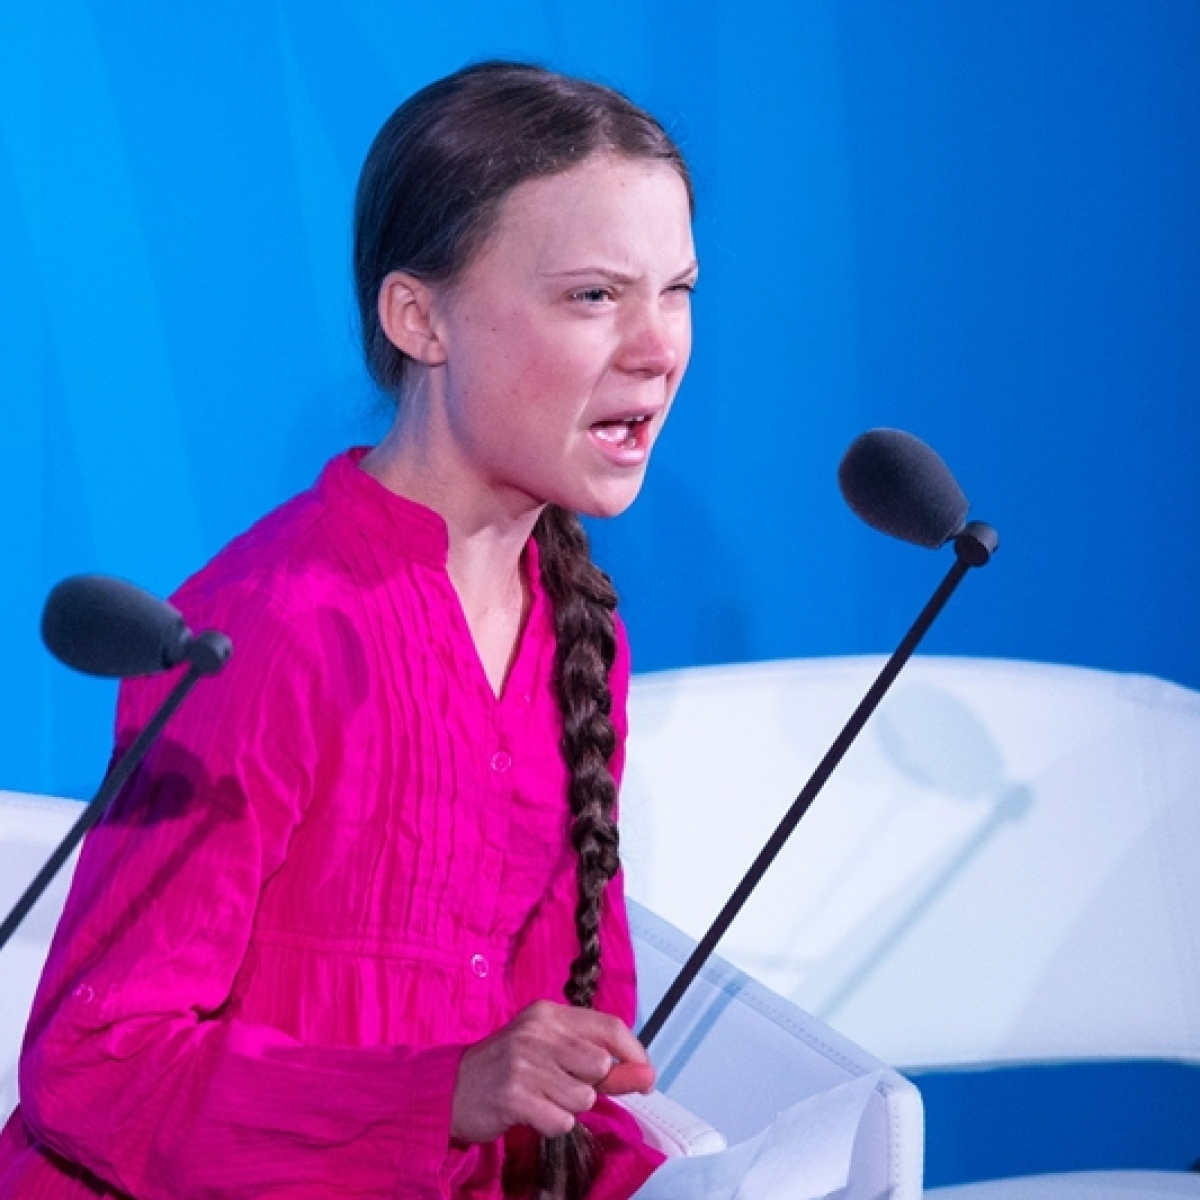 Activist Greta Thunburg among Alternative Nobel Prize winners